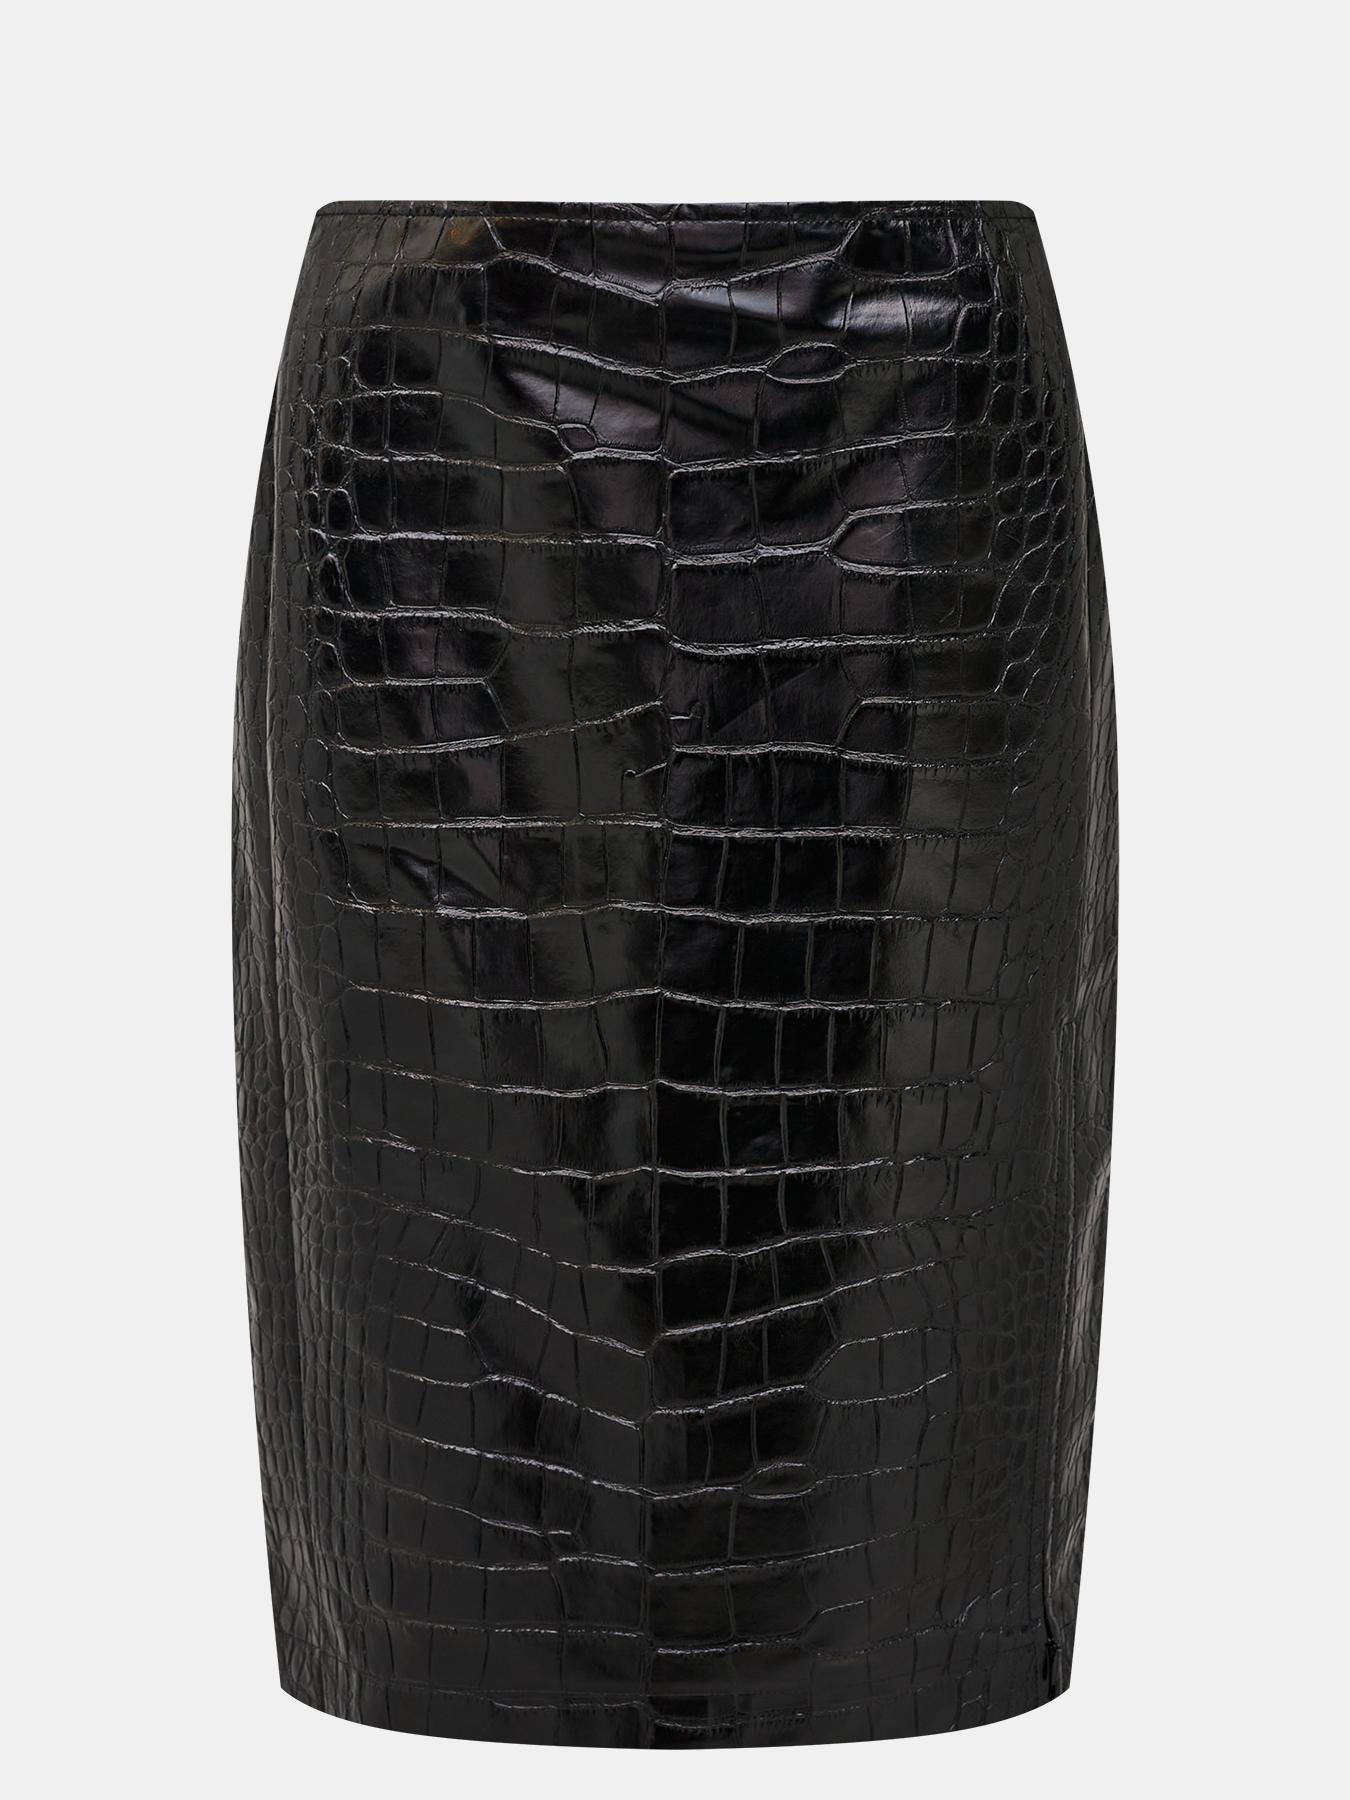 юбки Юбки Pennyblack Юбка